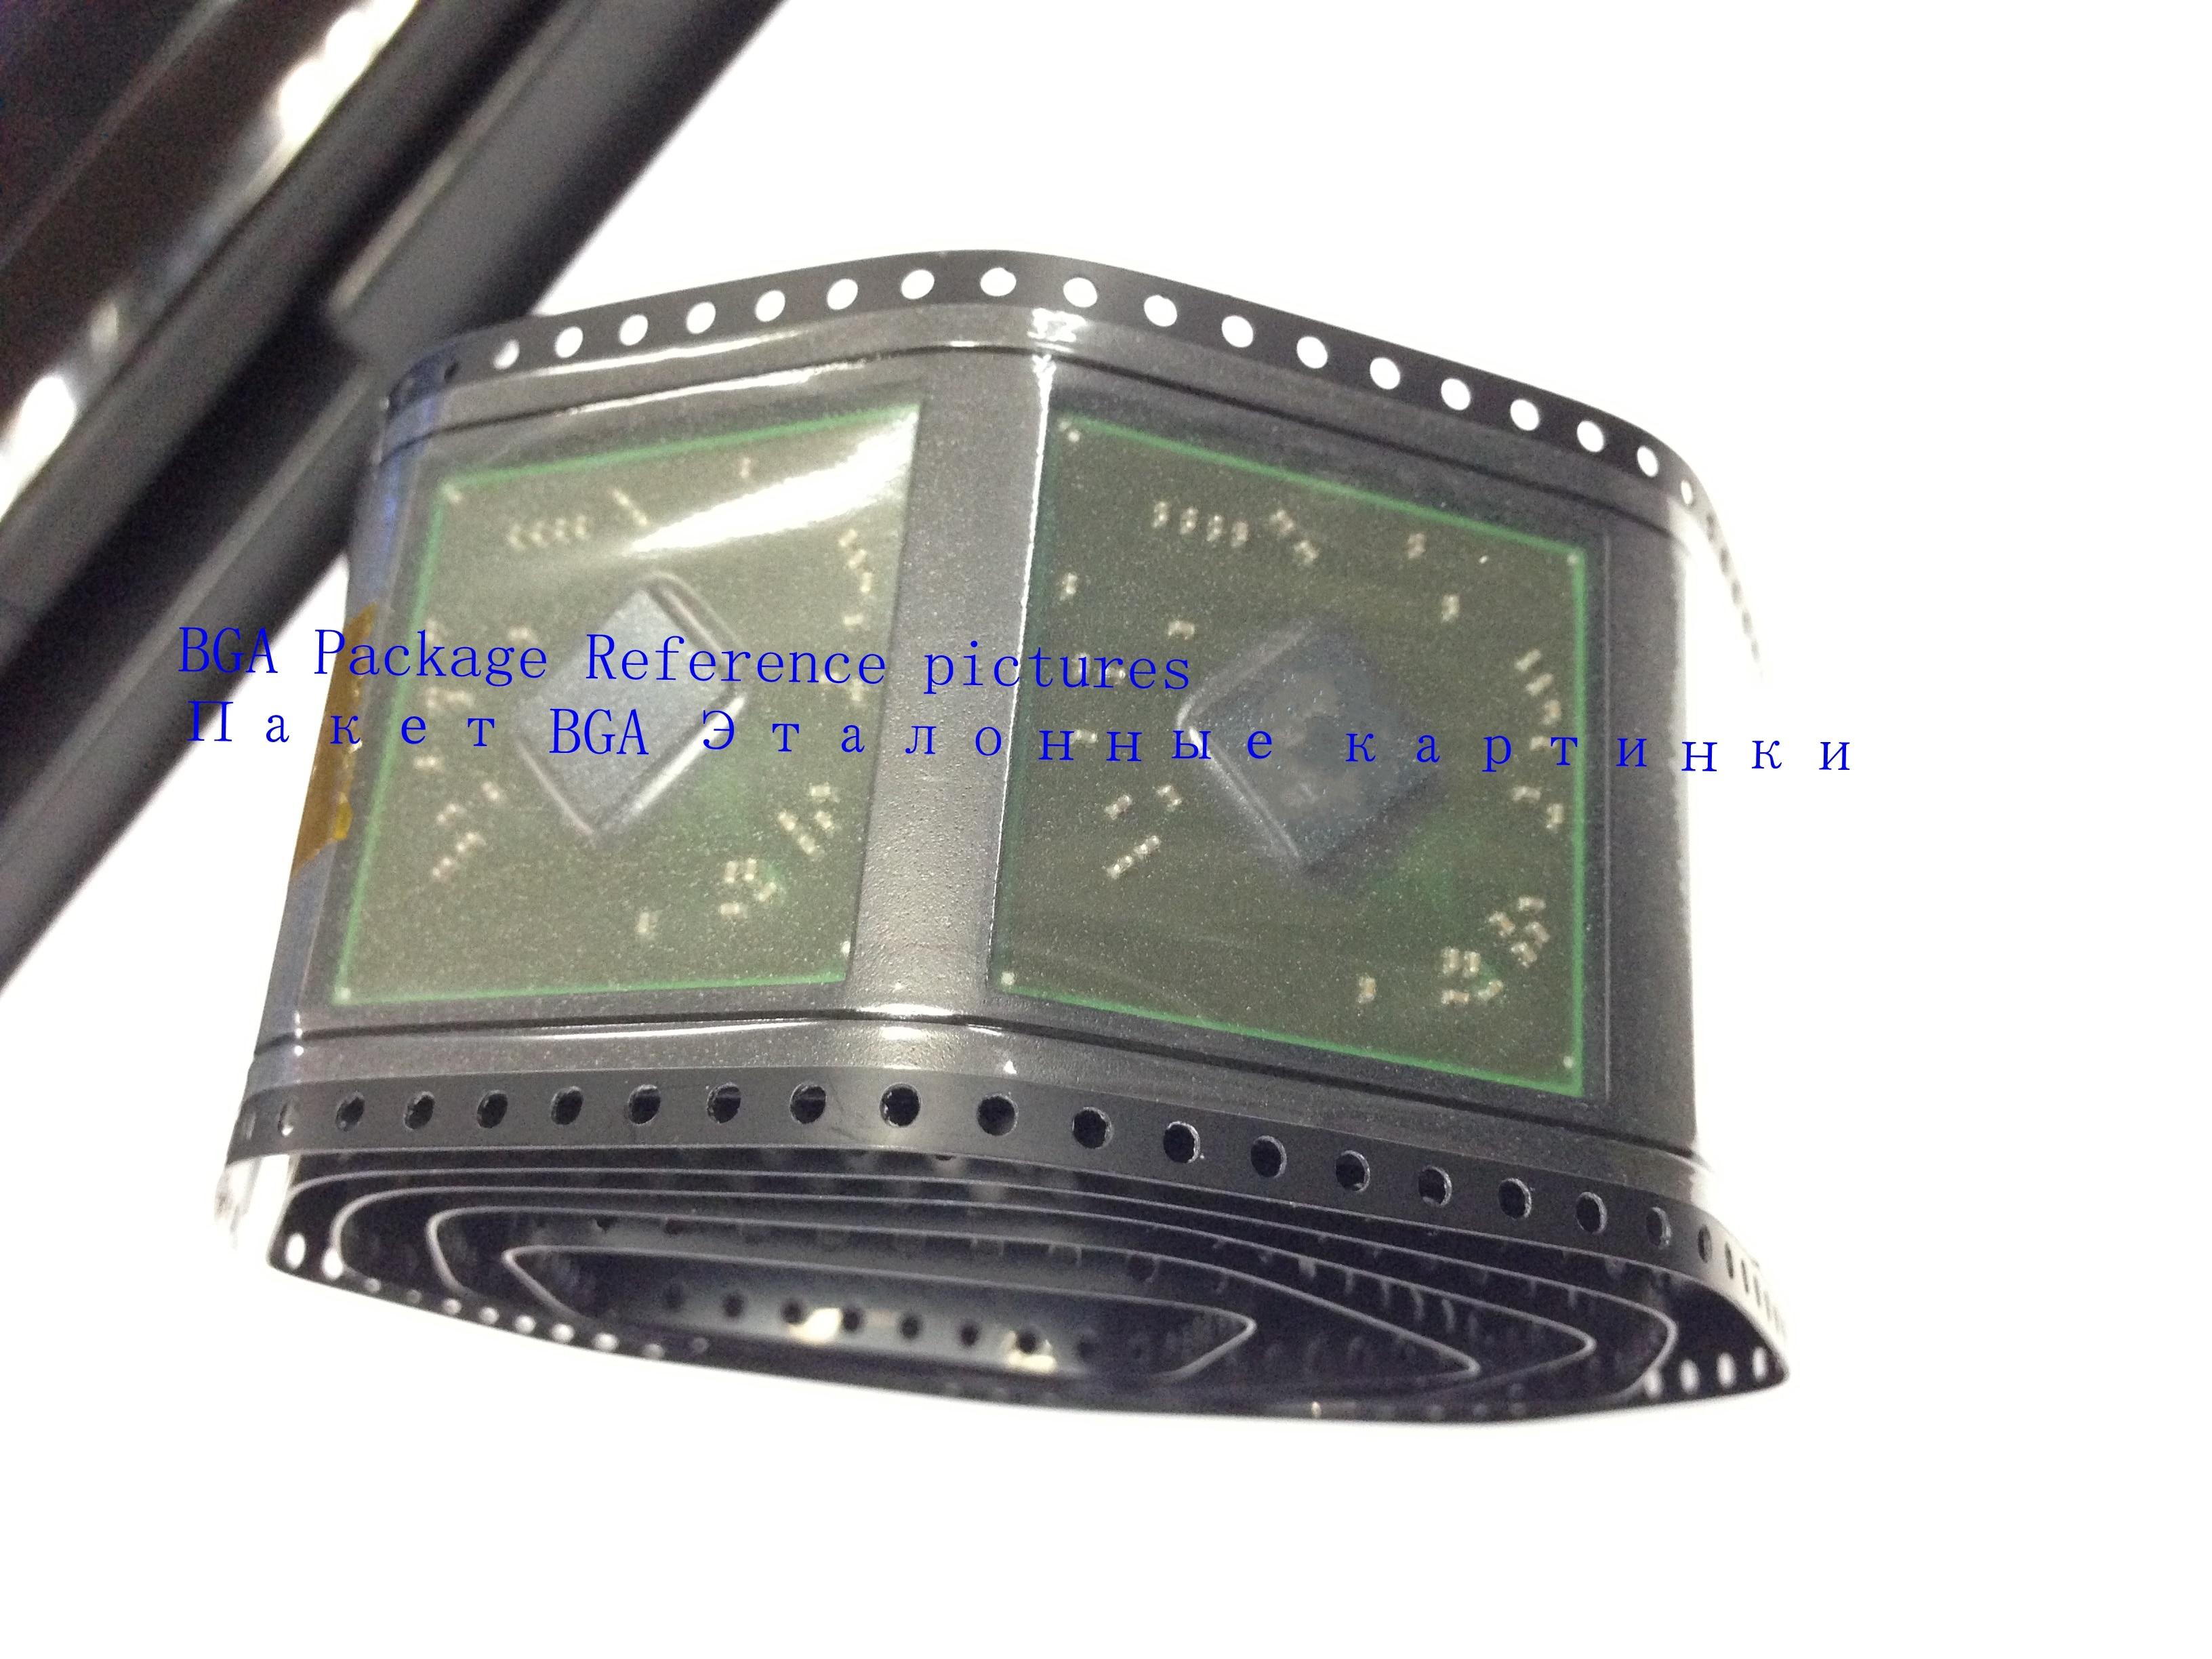 1pcs/lot 100% New N550 SLBXF BGA Chipset1pcs/lot 100% New N550 SLBXF BGA Chipset